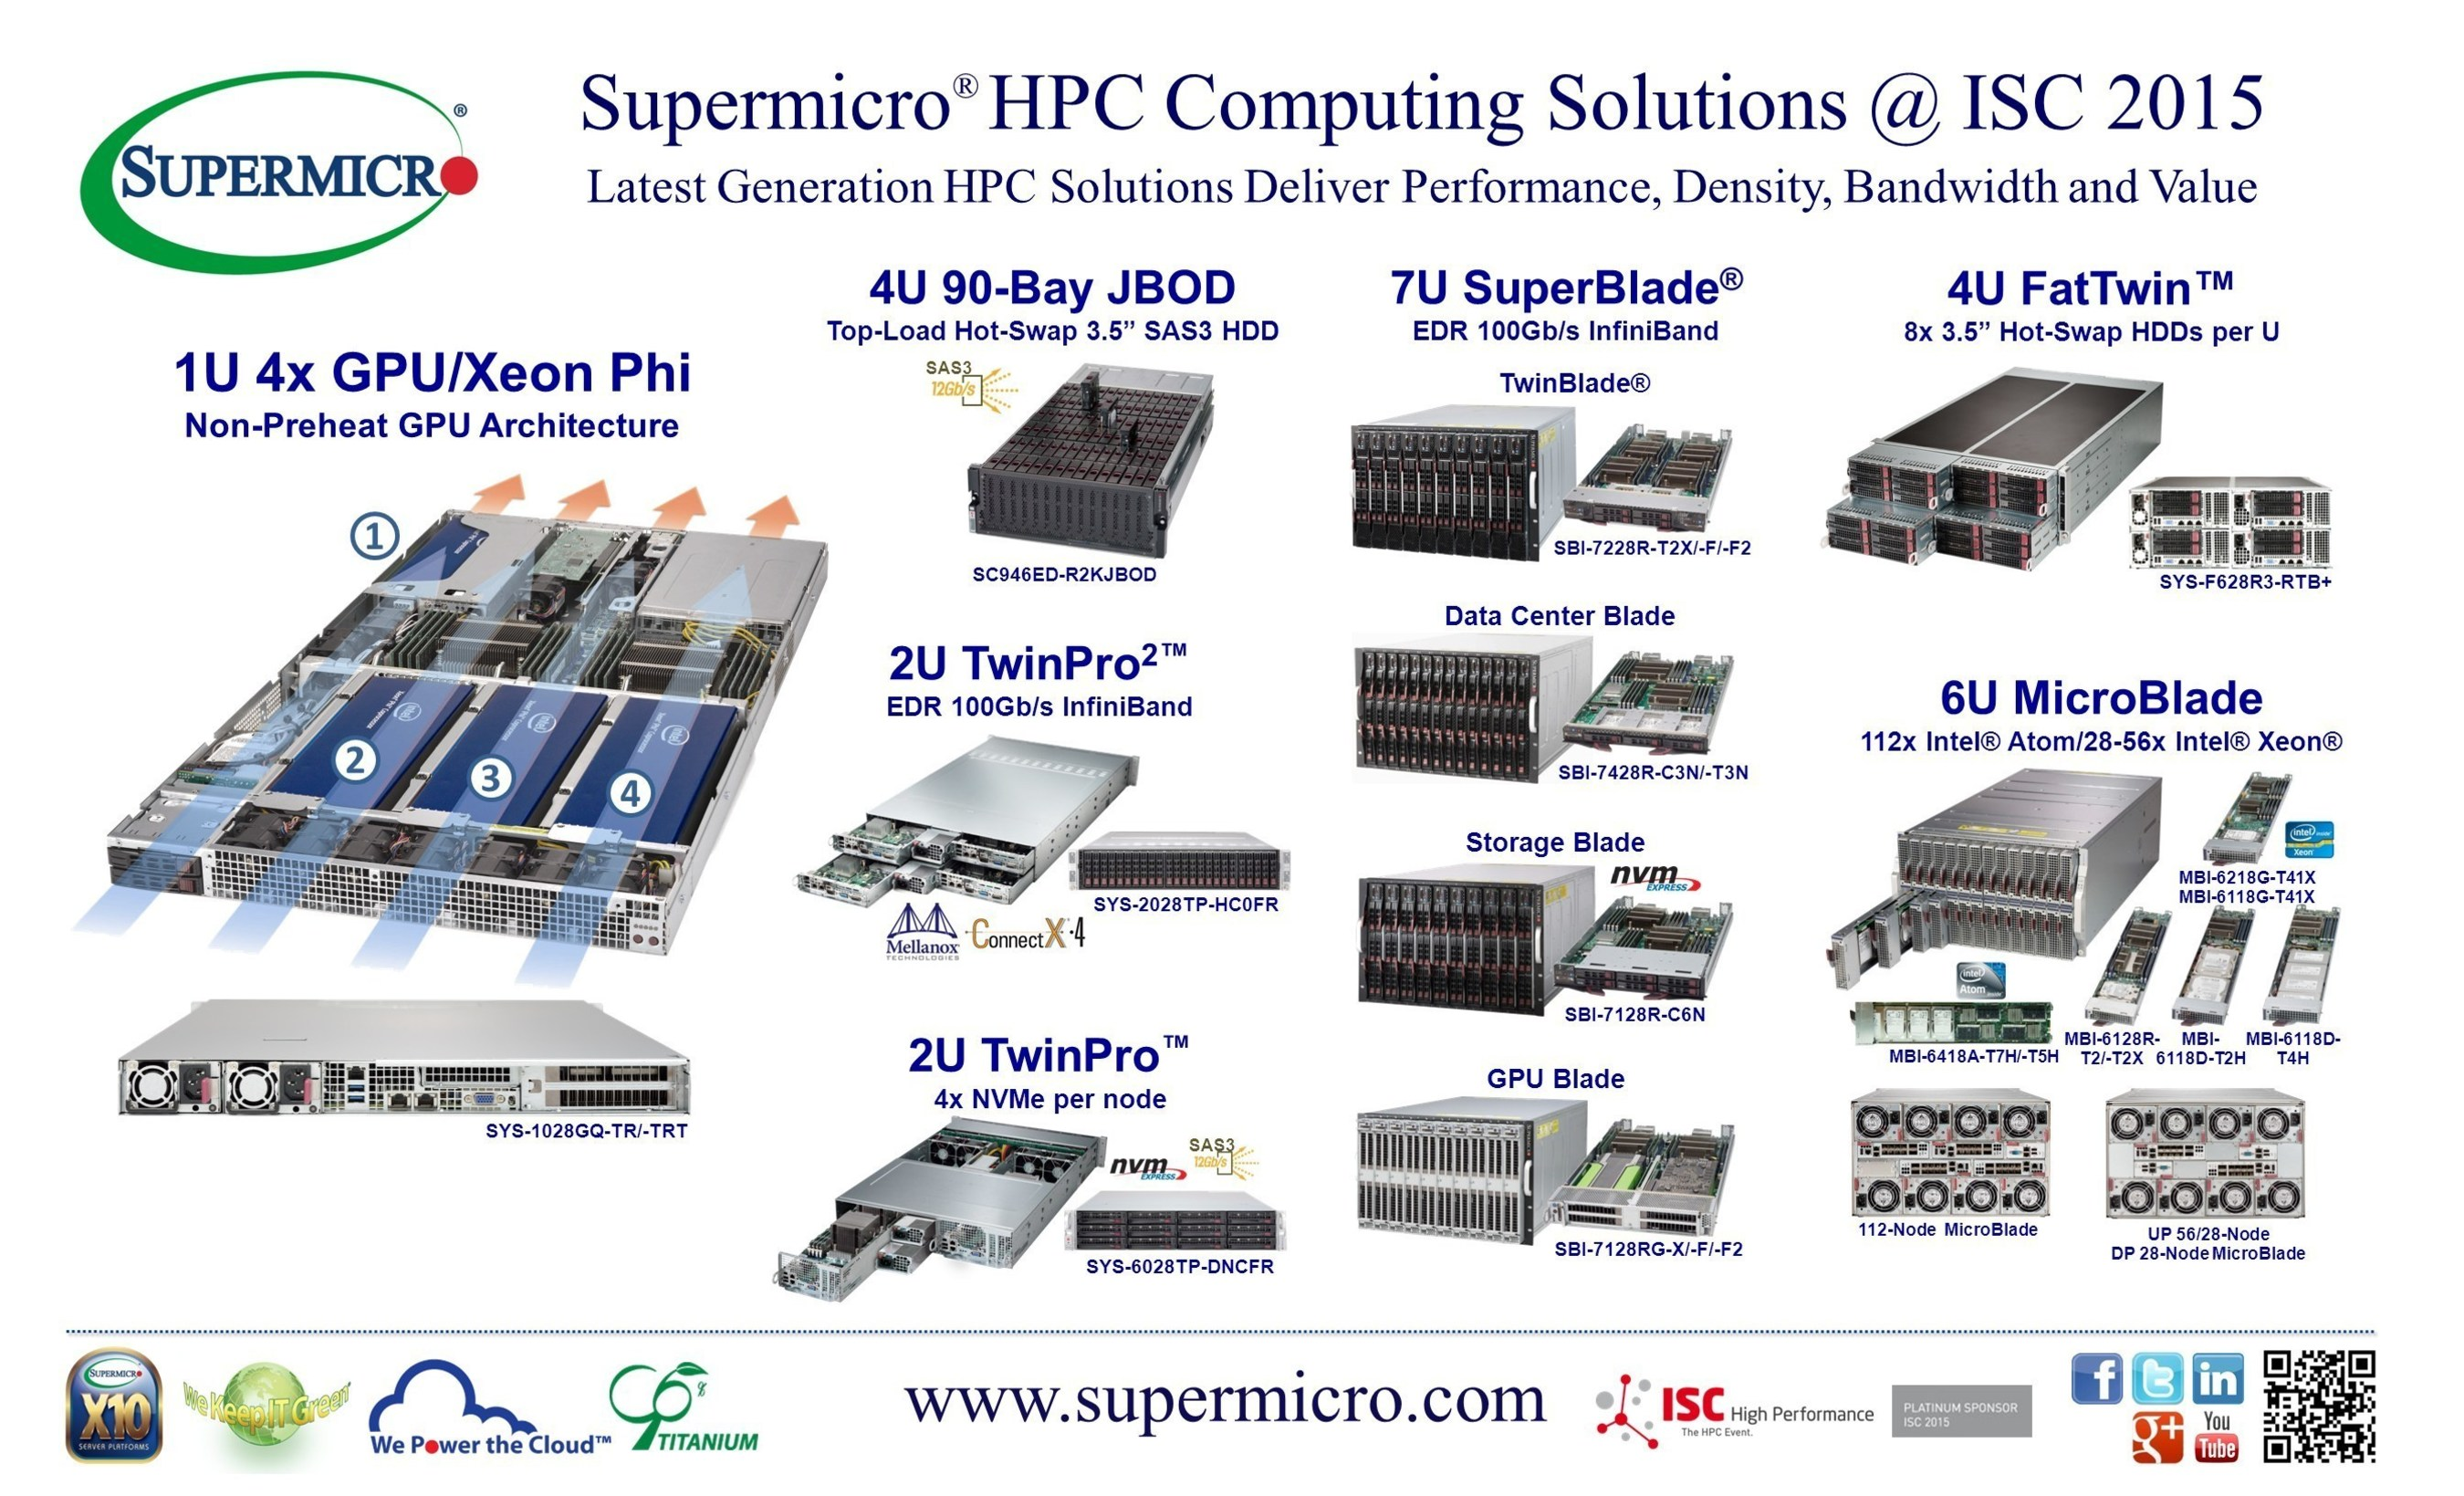 Supermicro(R) 1U 4x GPU/Xeon Phi, EDR 100Gb/s IB Solutions for HPC @ ISC 2015